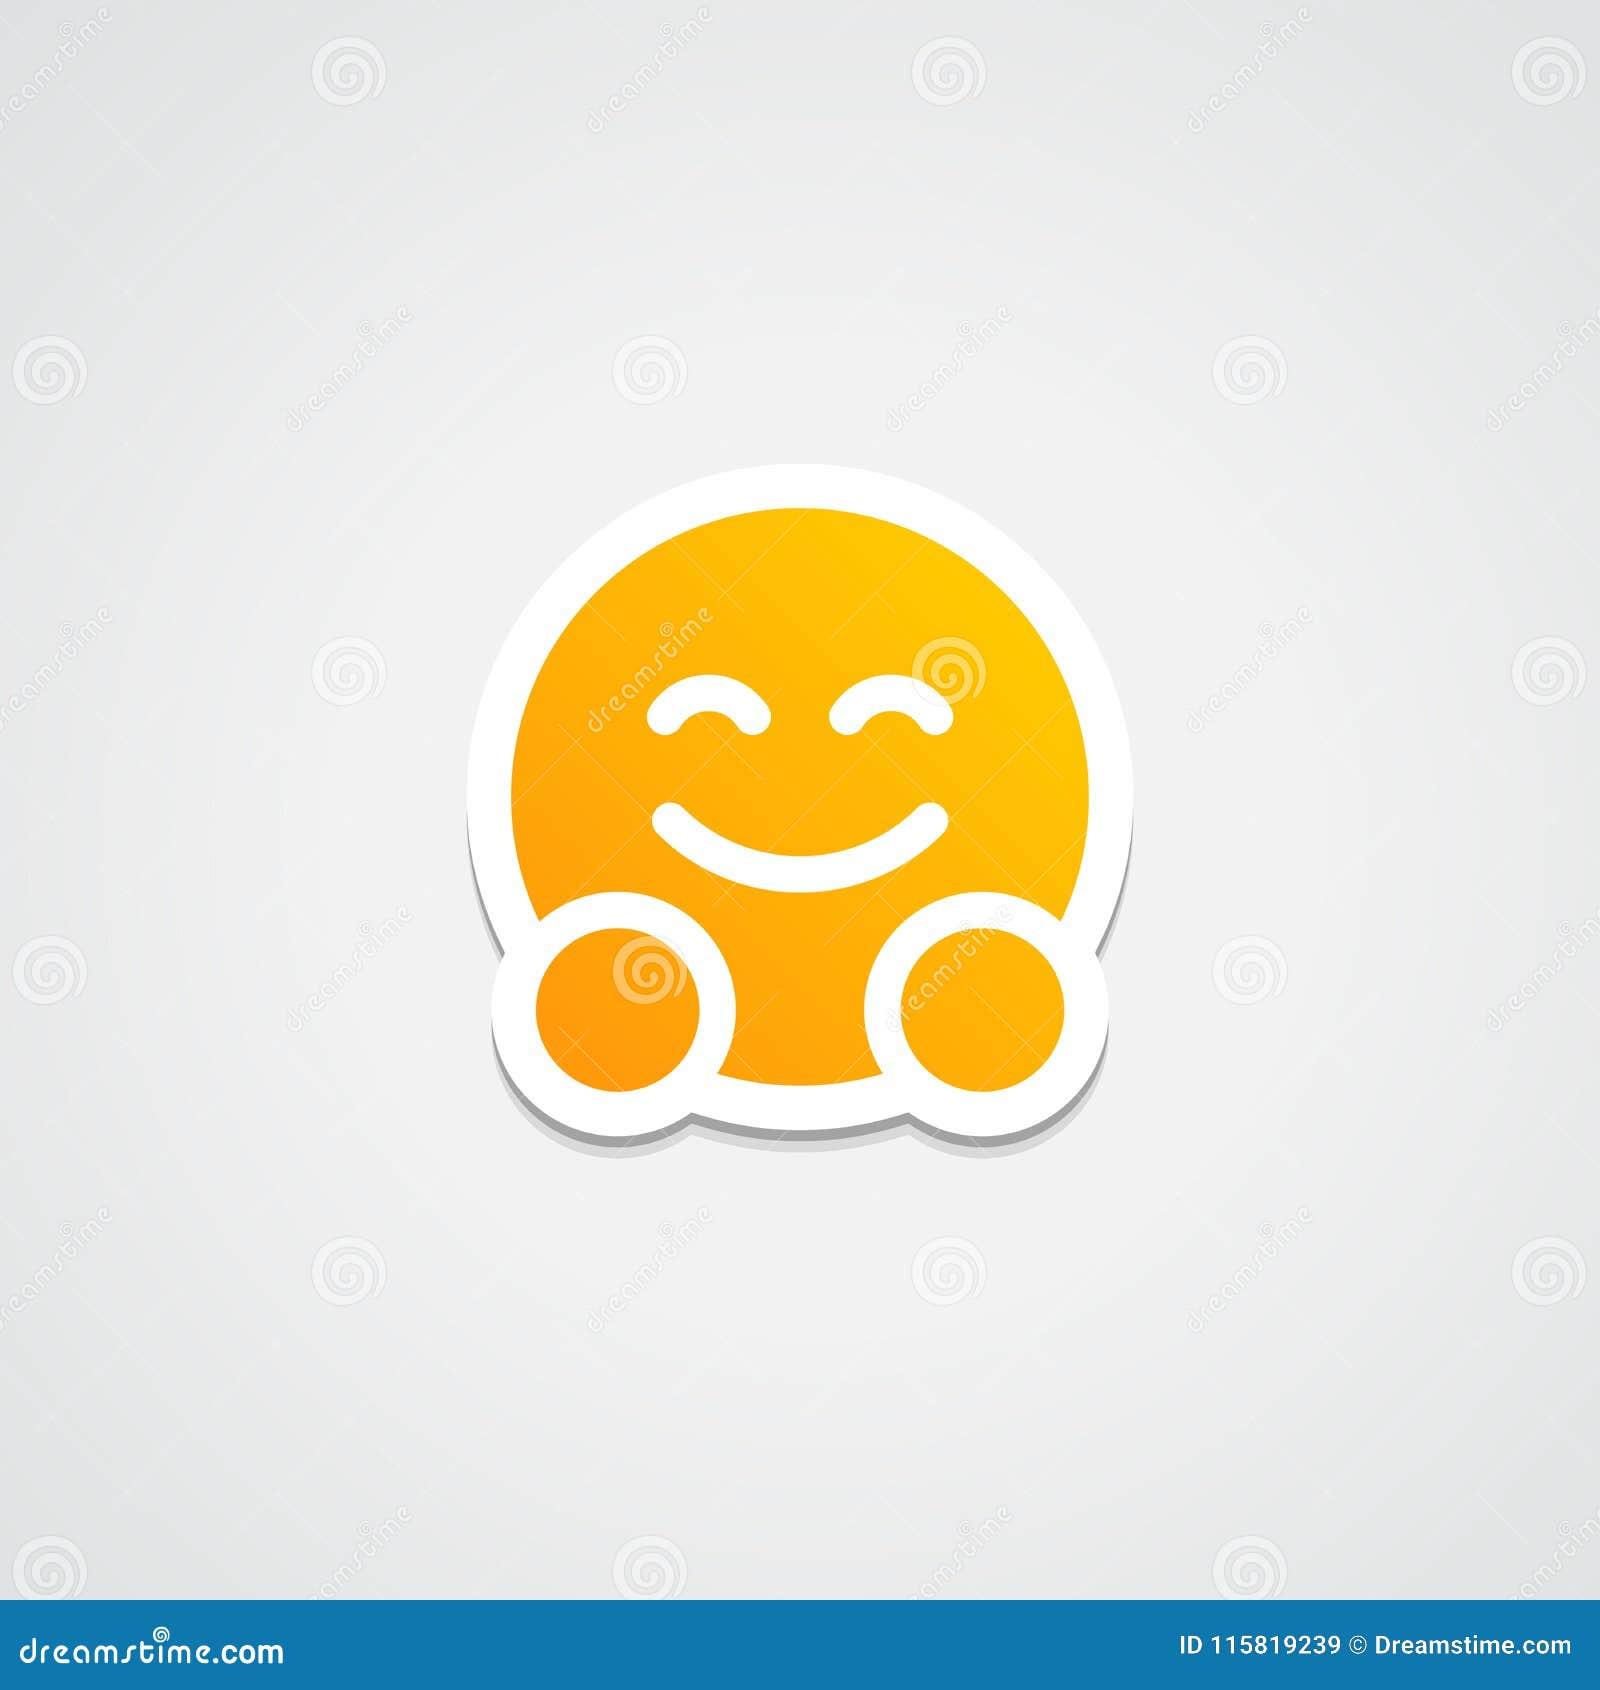 Hug Emoji Sticker Icon Stock Vector Illustration Of Sticker 115819239